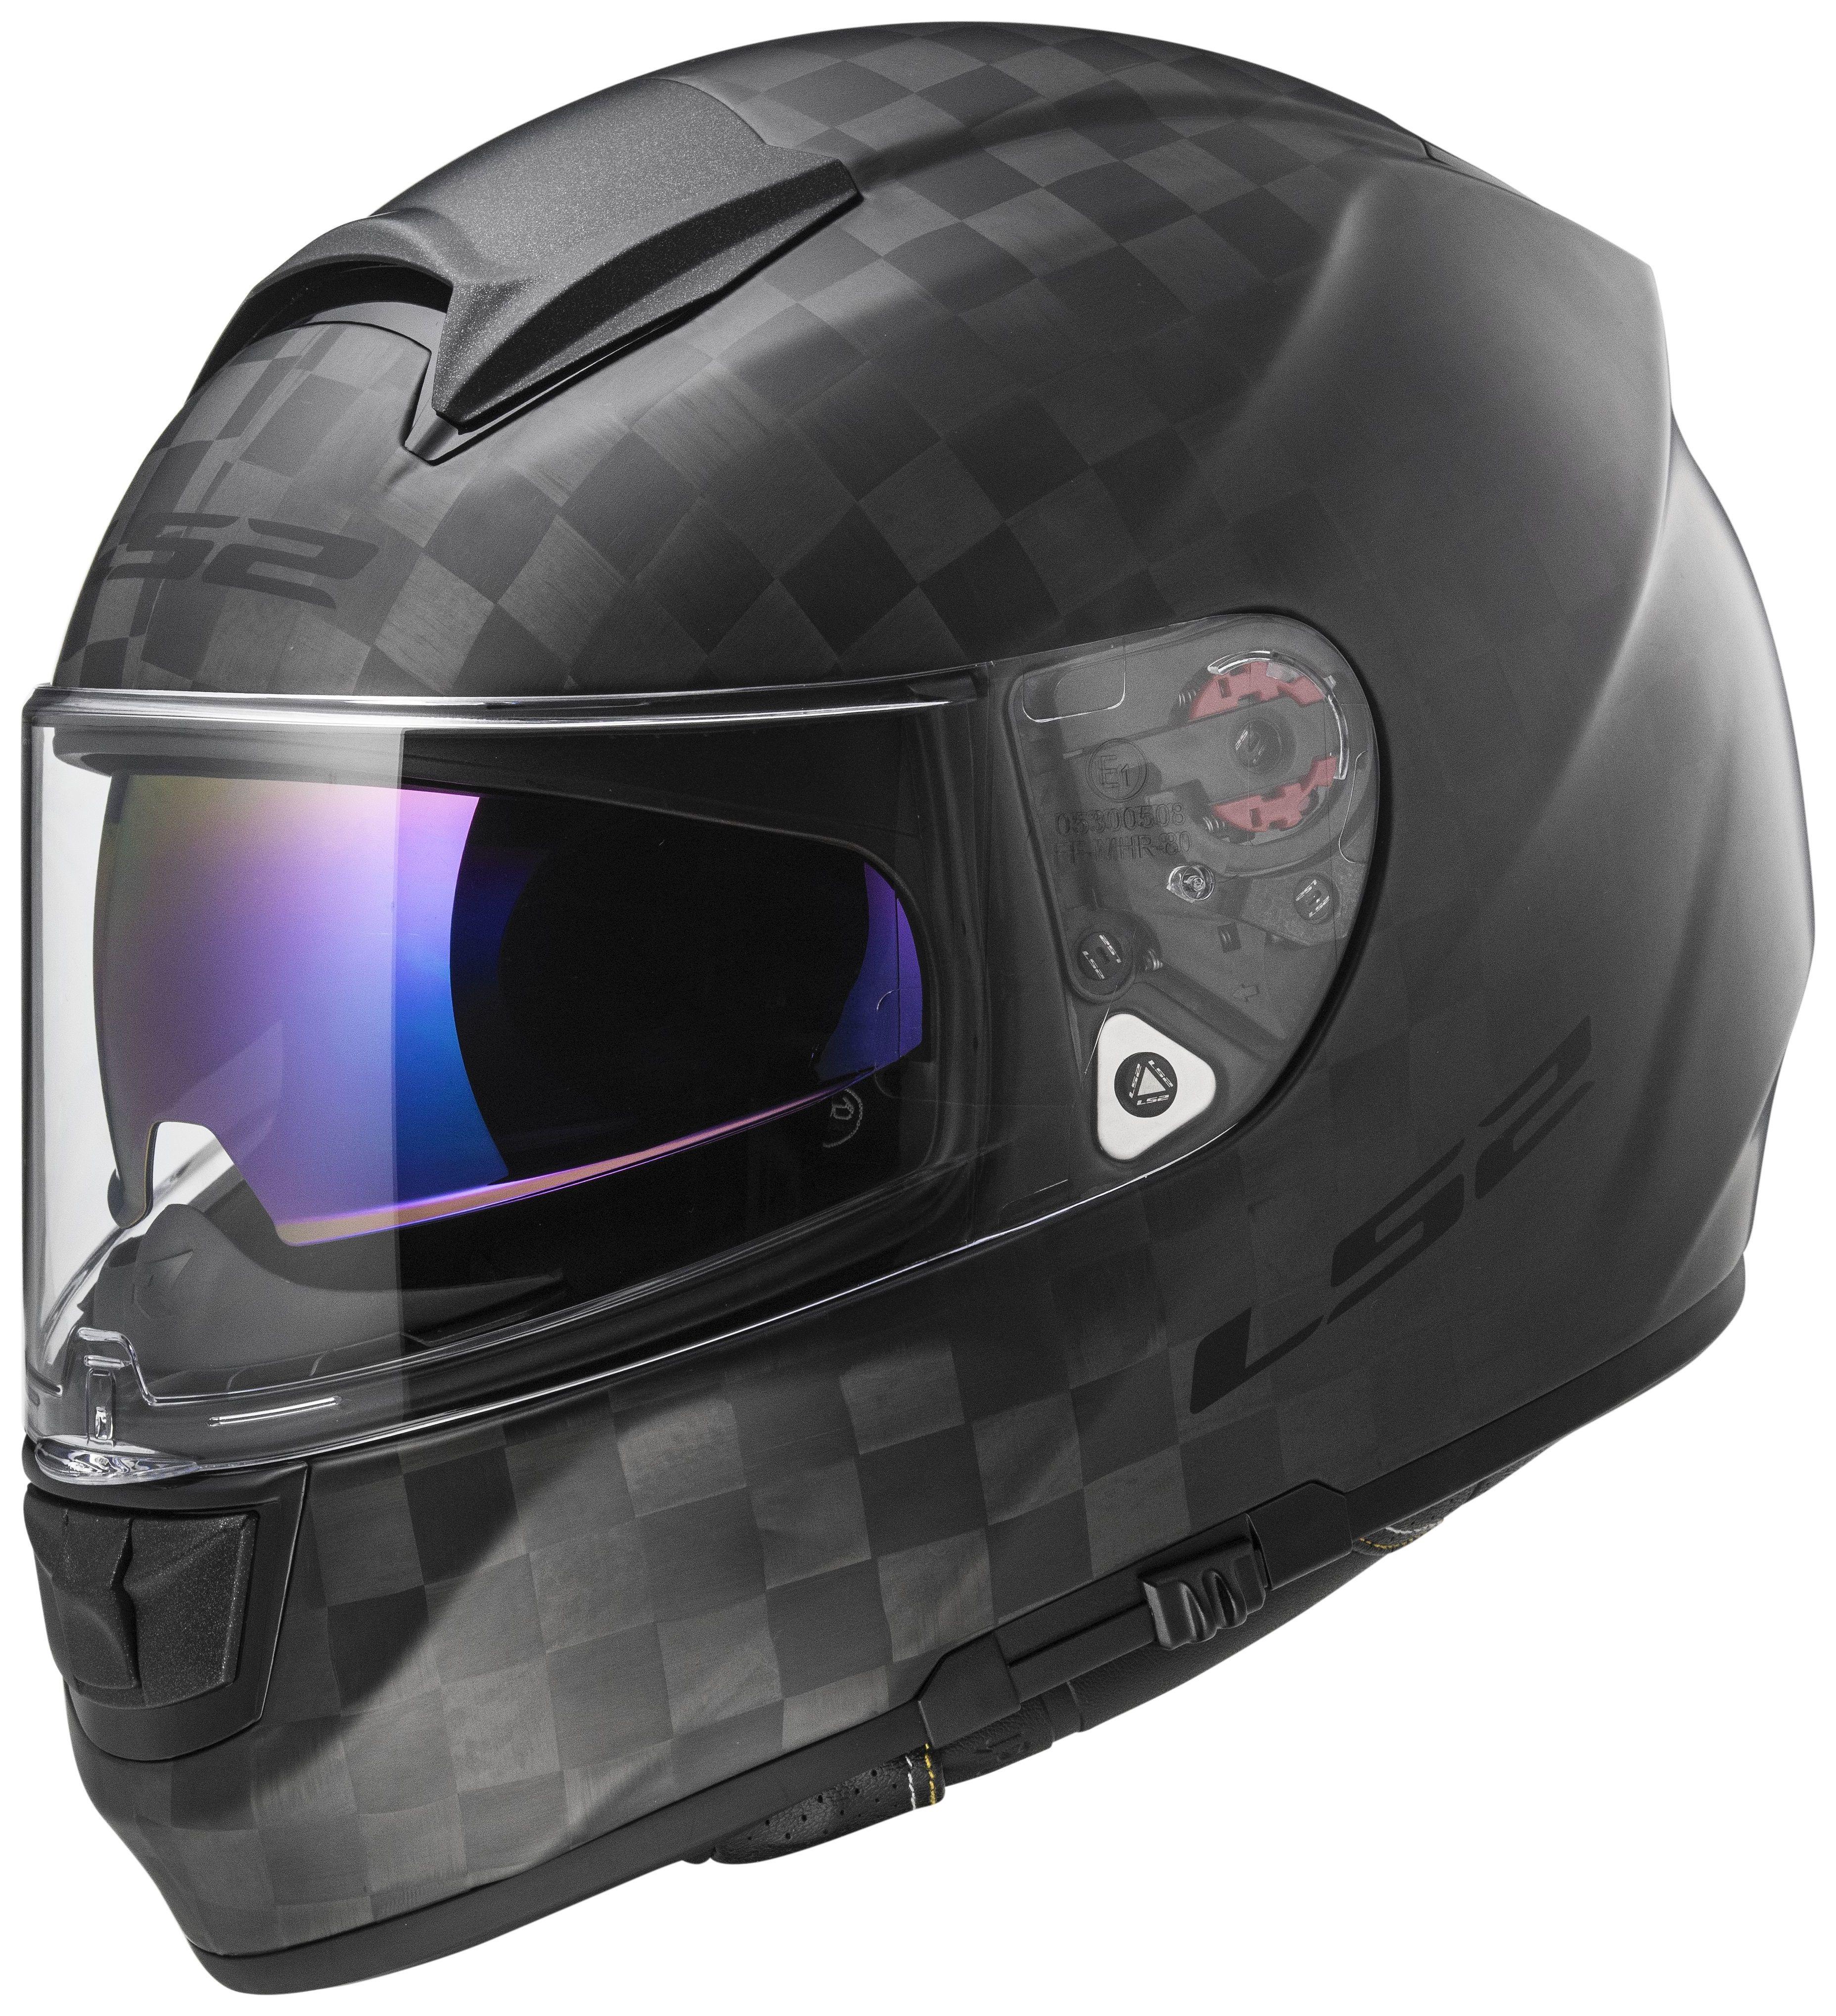 LS2 Citation Carbon Motorcycle Helmet.(XS - 3XL)  $199.99 + FS at Revzilla or CycleGear